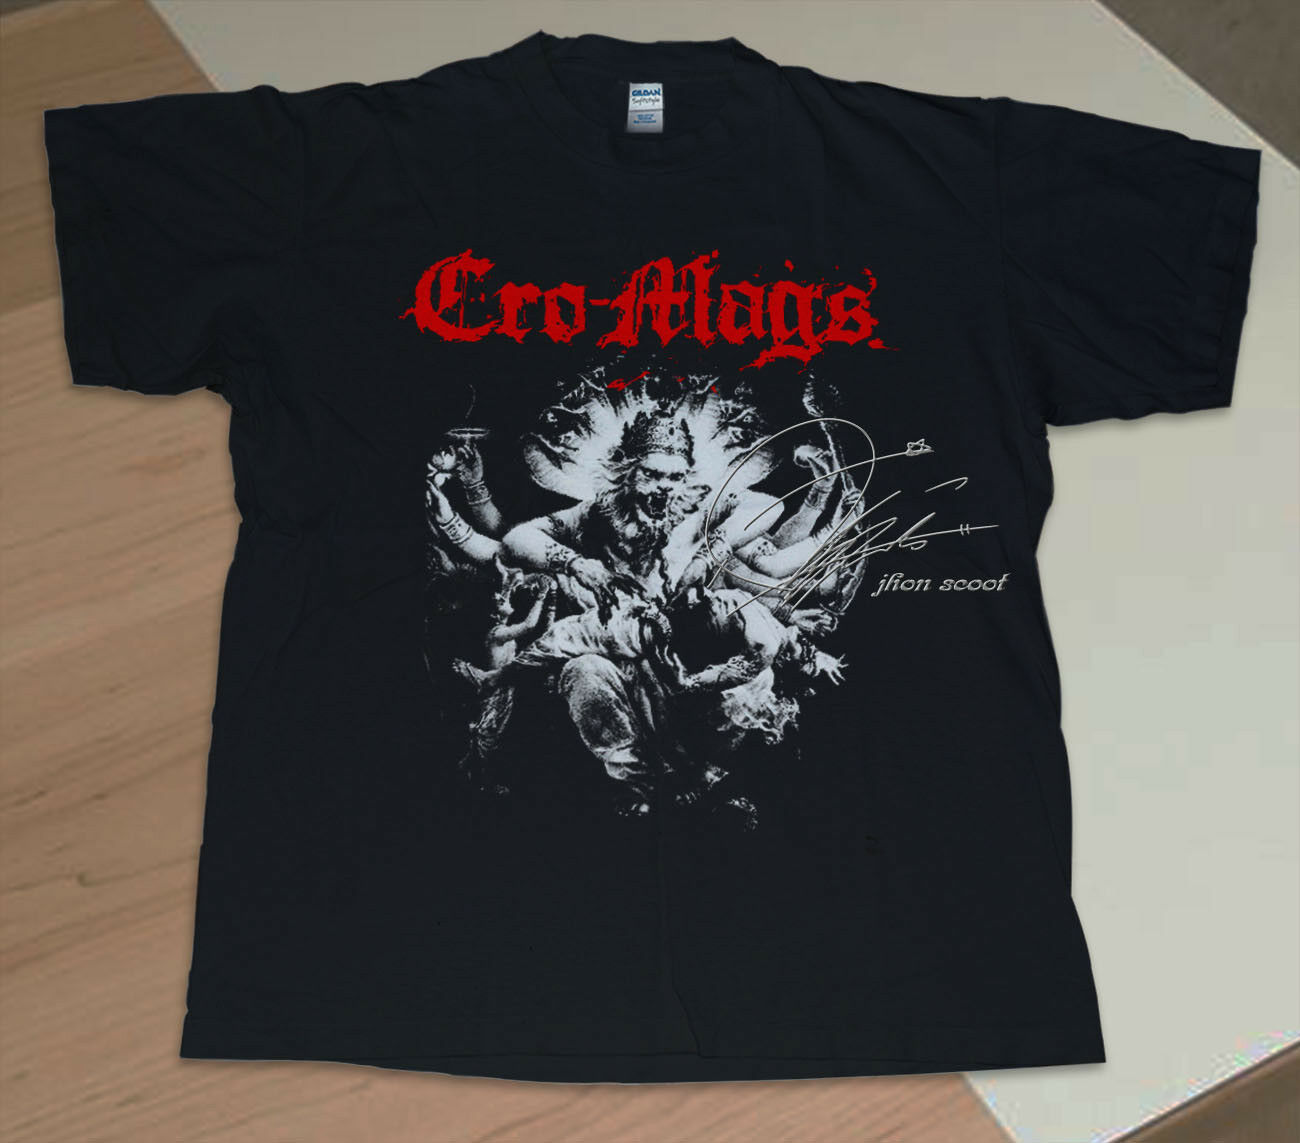 T Shirt Vintage Cro Mags Best Wishes เสื้อยืดวินเทจ